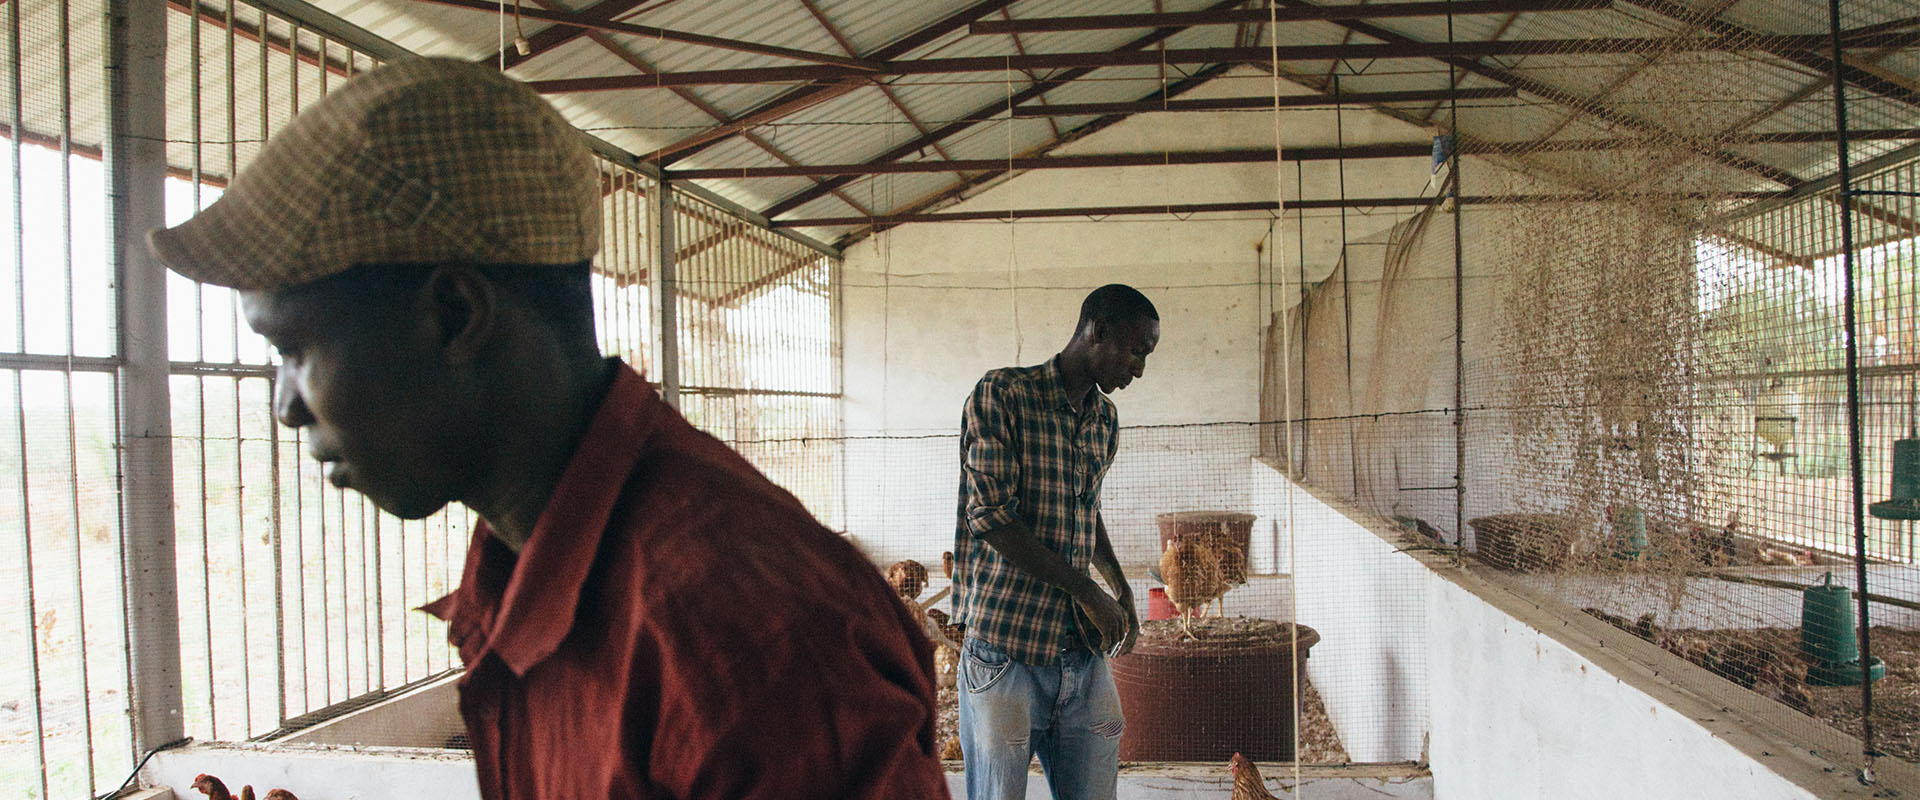 pollaio polli Guinea Bissau Mani Tese 2017